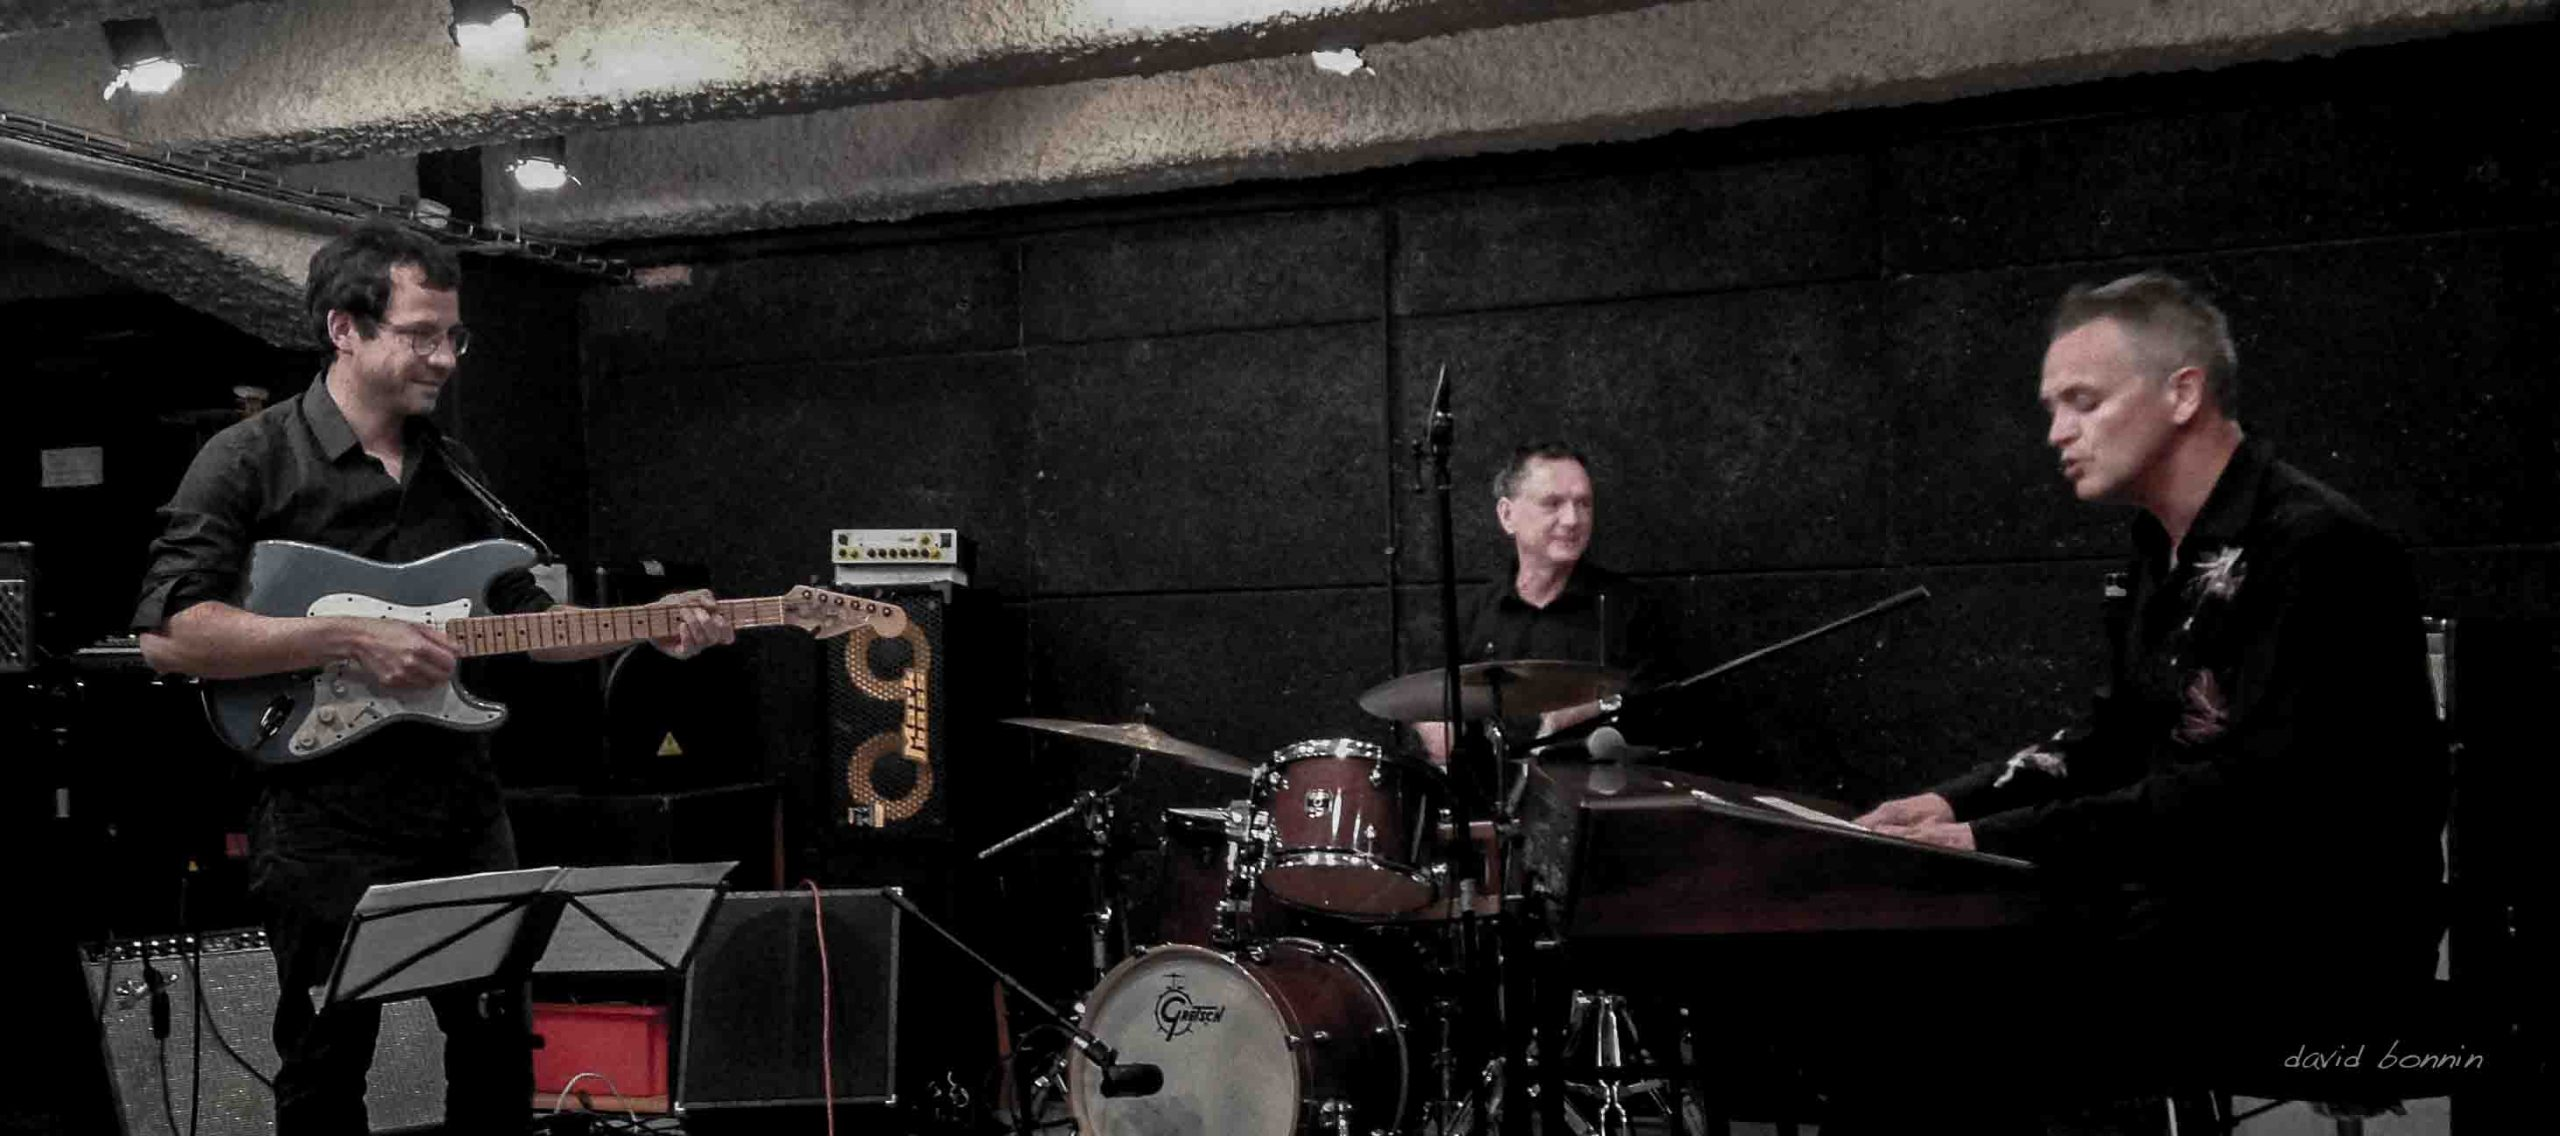 Organic trio en concert au Jazz Club de Savoie